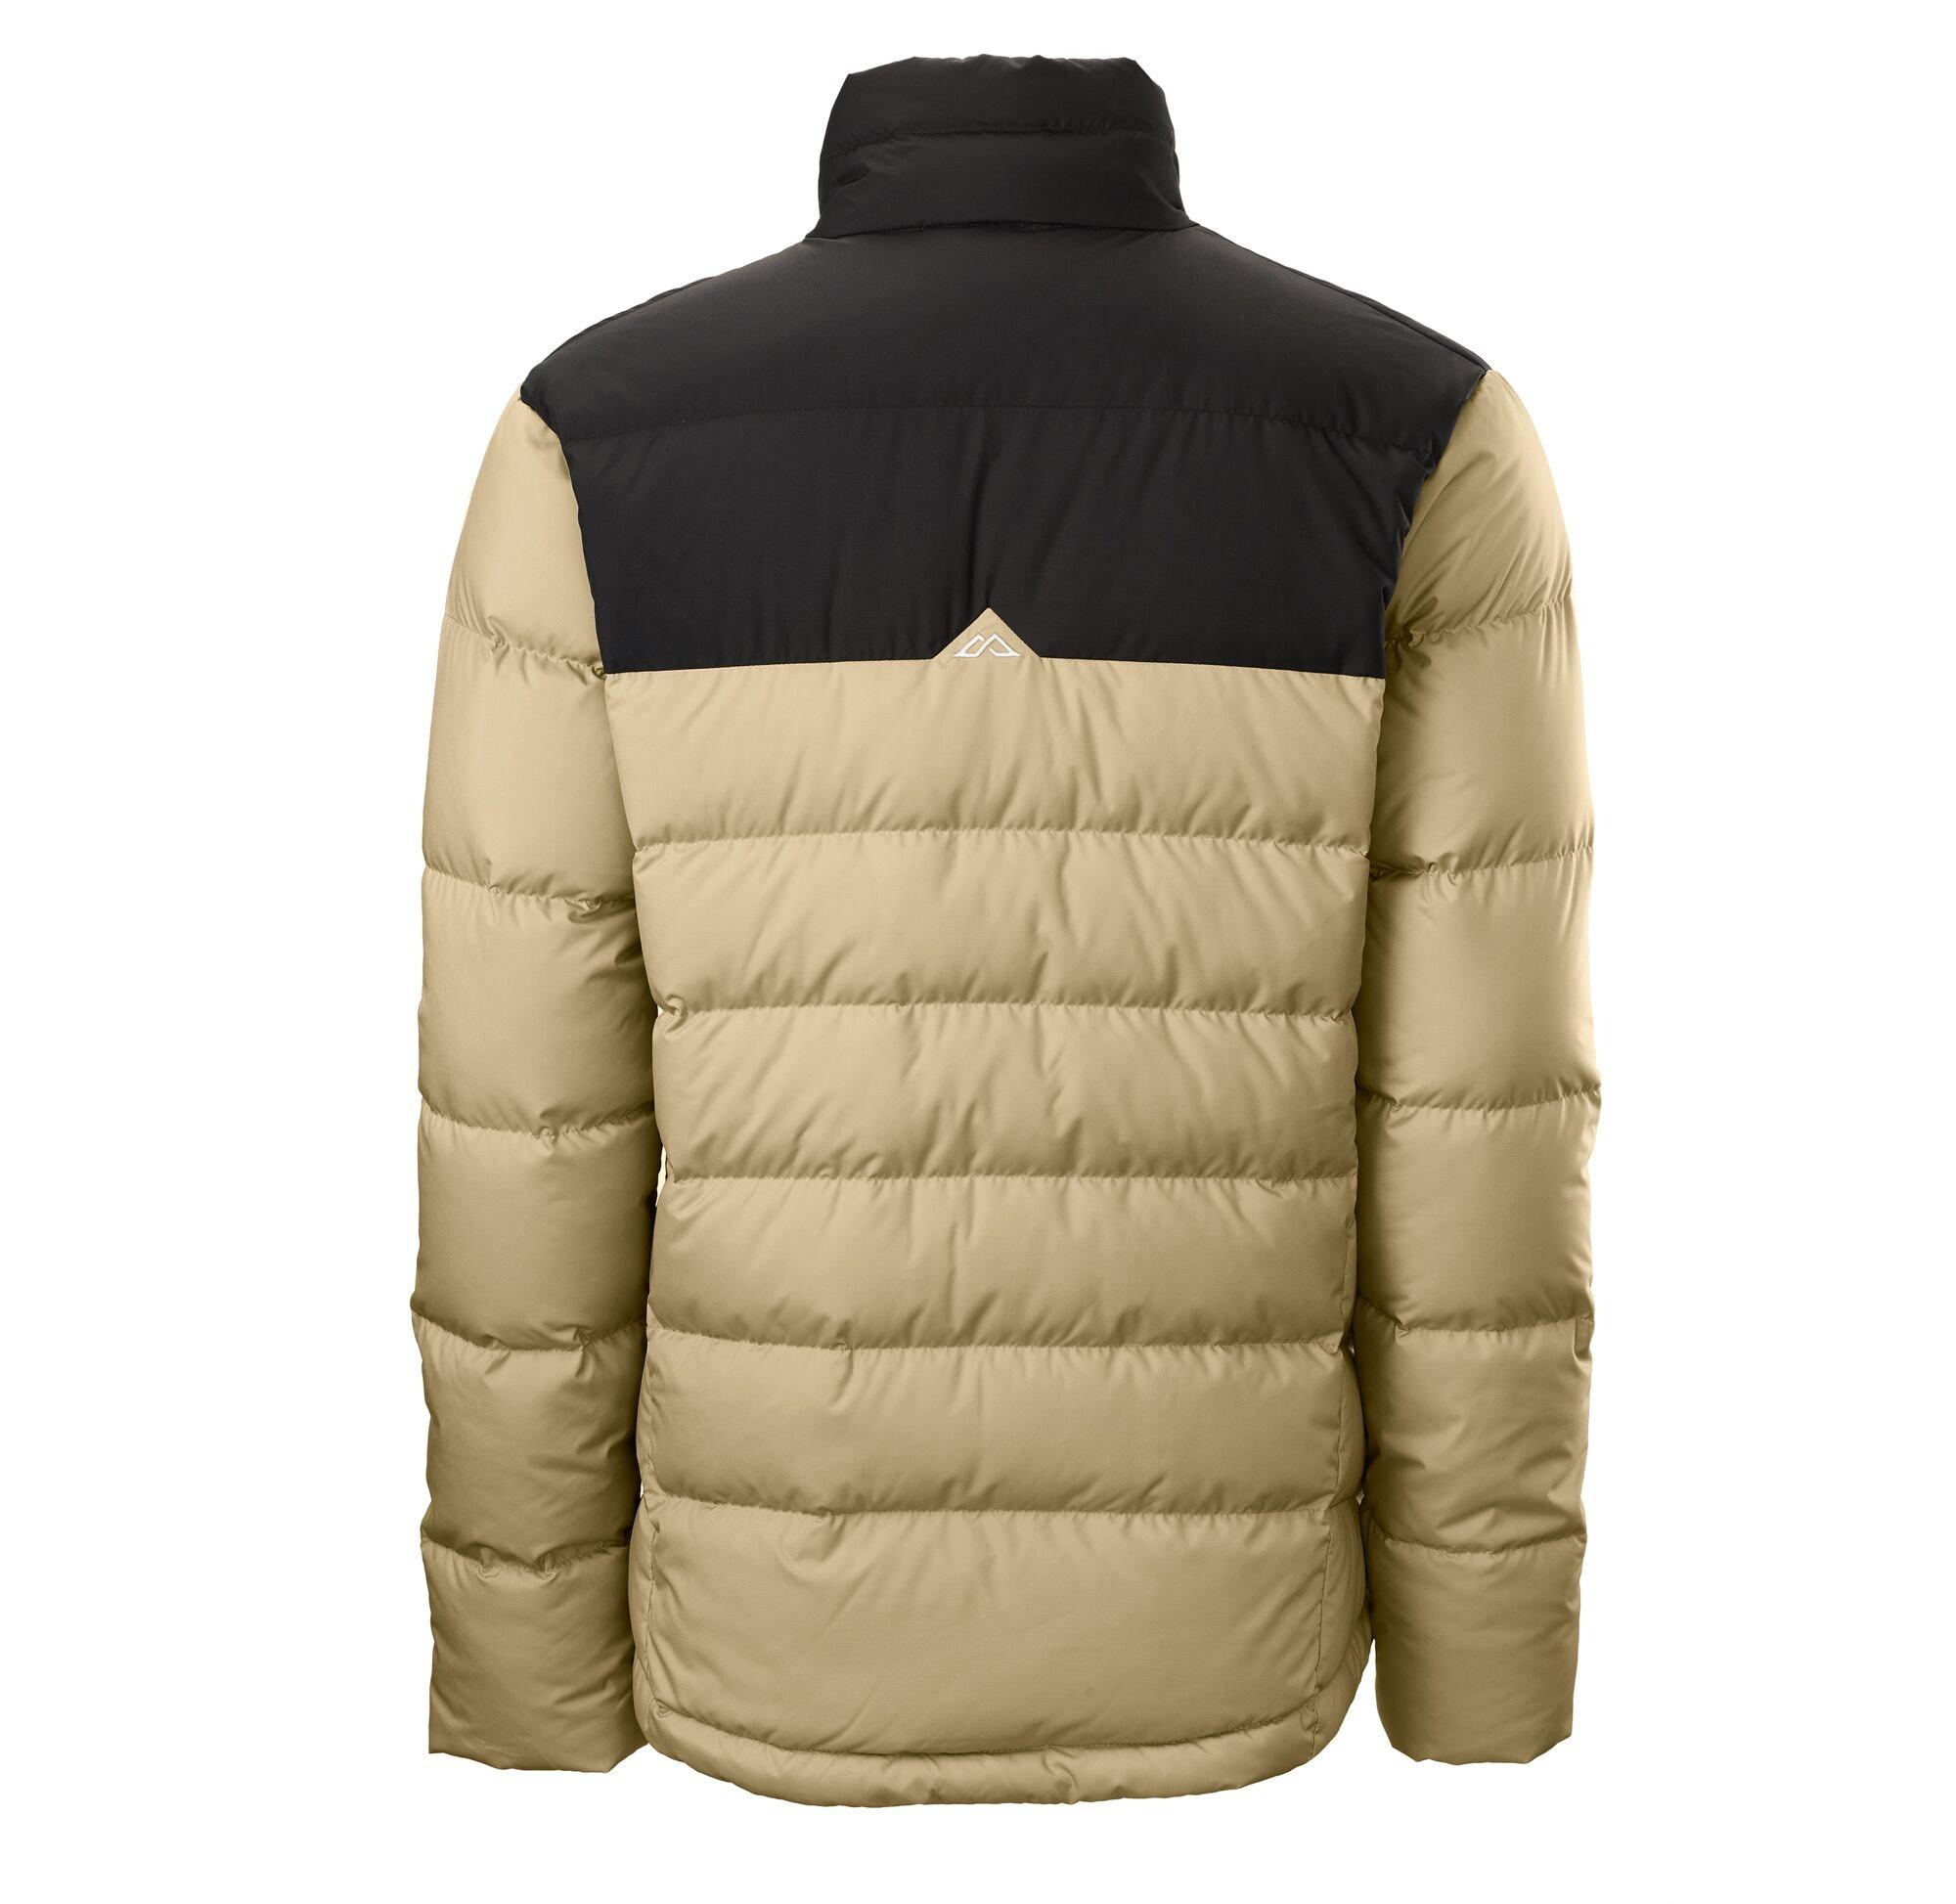 thumbnail 30 - NEW Kathmandu Epiq Mens 600 Fill Down Puffer Warm Outdoor Winter Jacket